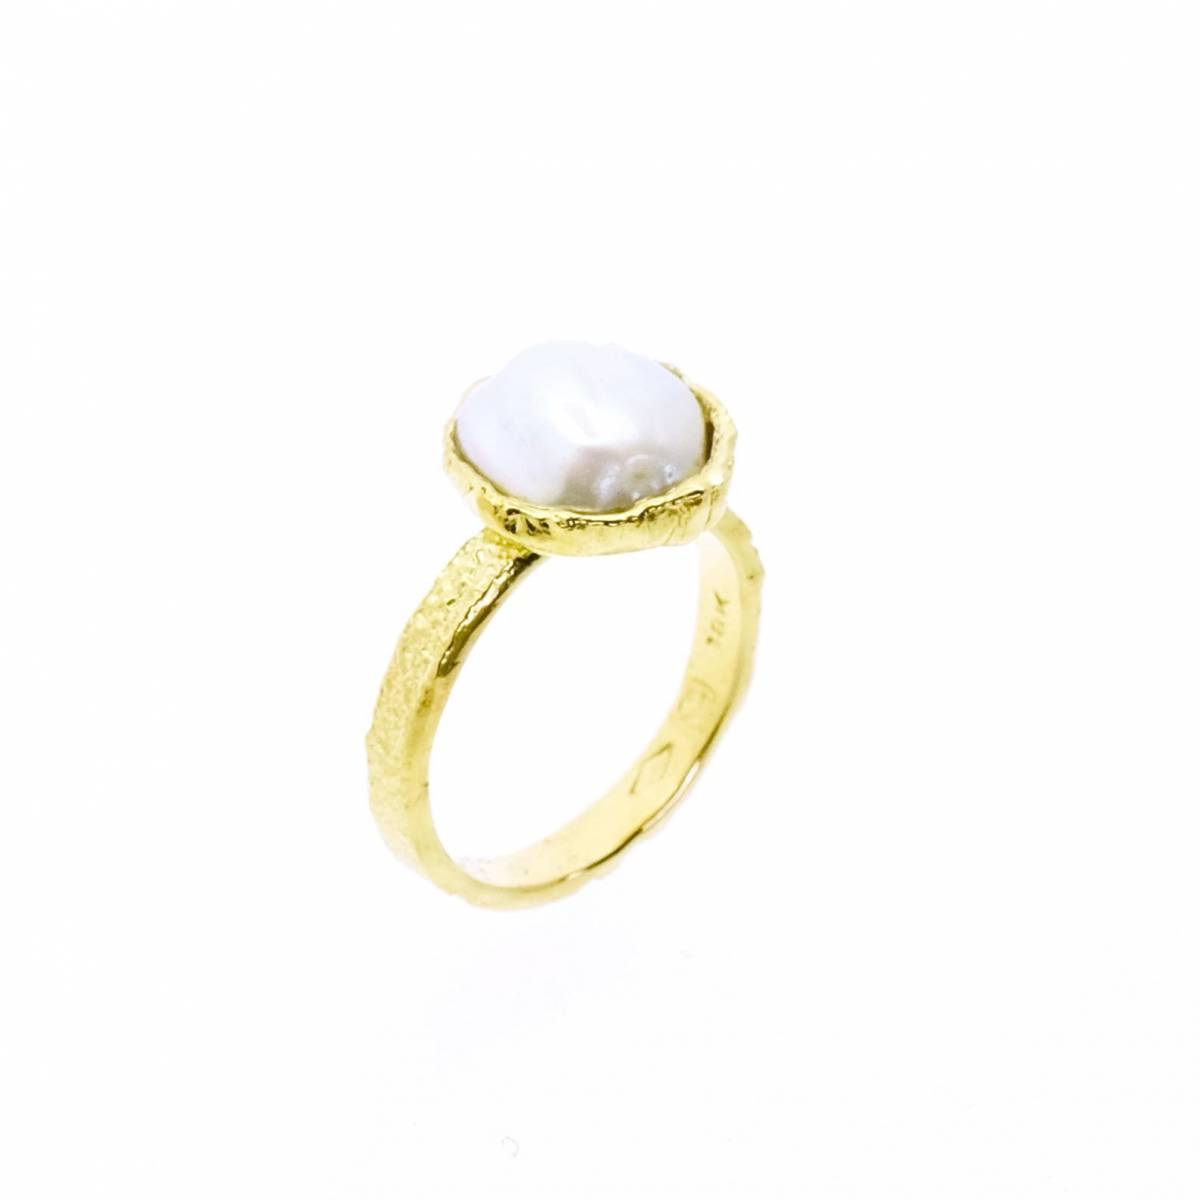 Jonas Maes Jewels - Juwelen - Bruidsjuwelen - Verlovingsring - Trouwring - House of Weddings - 16